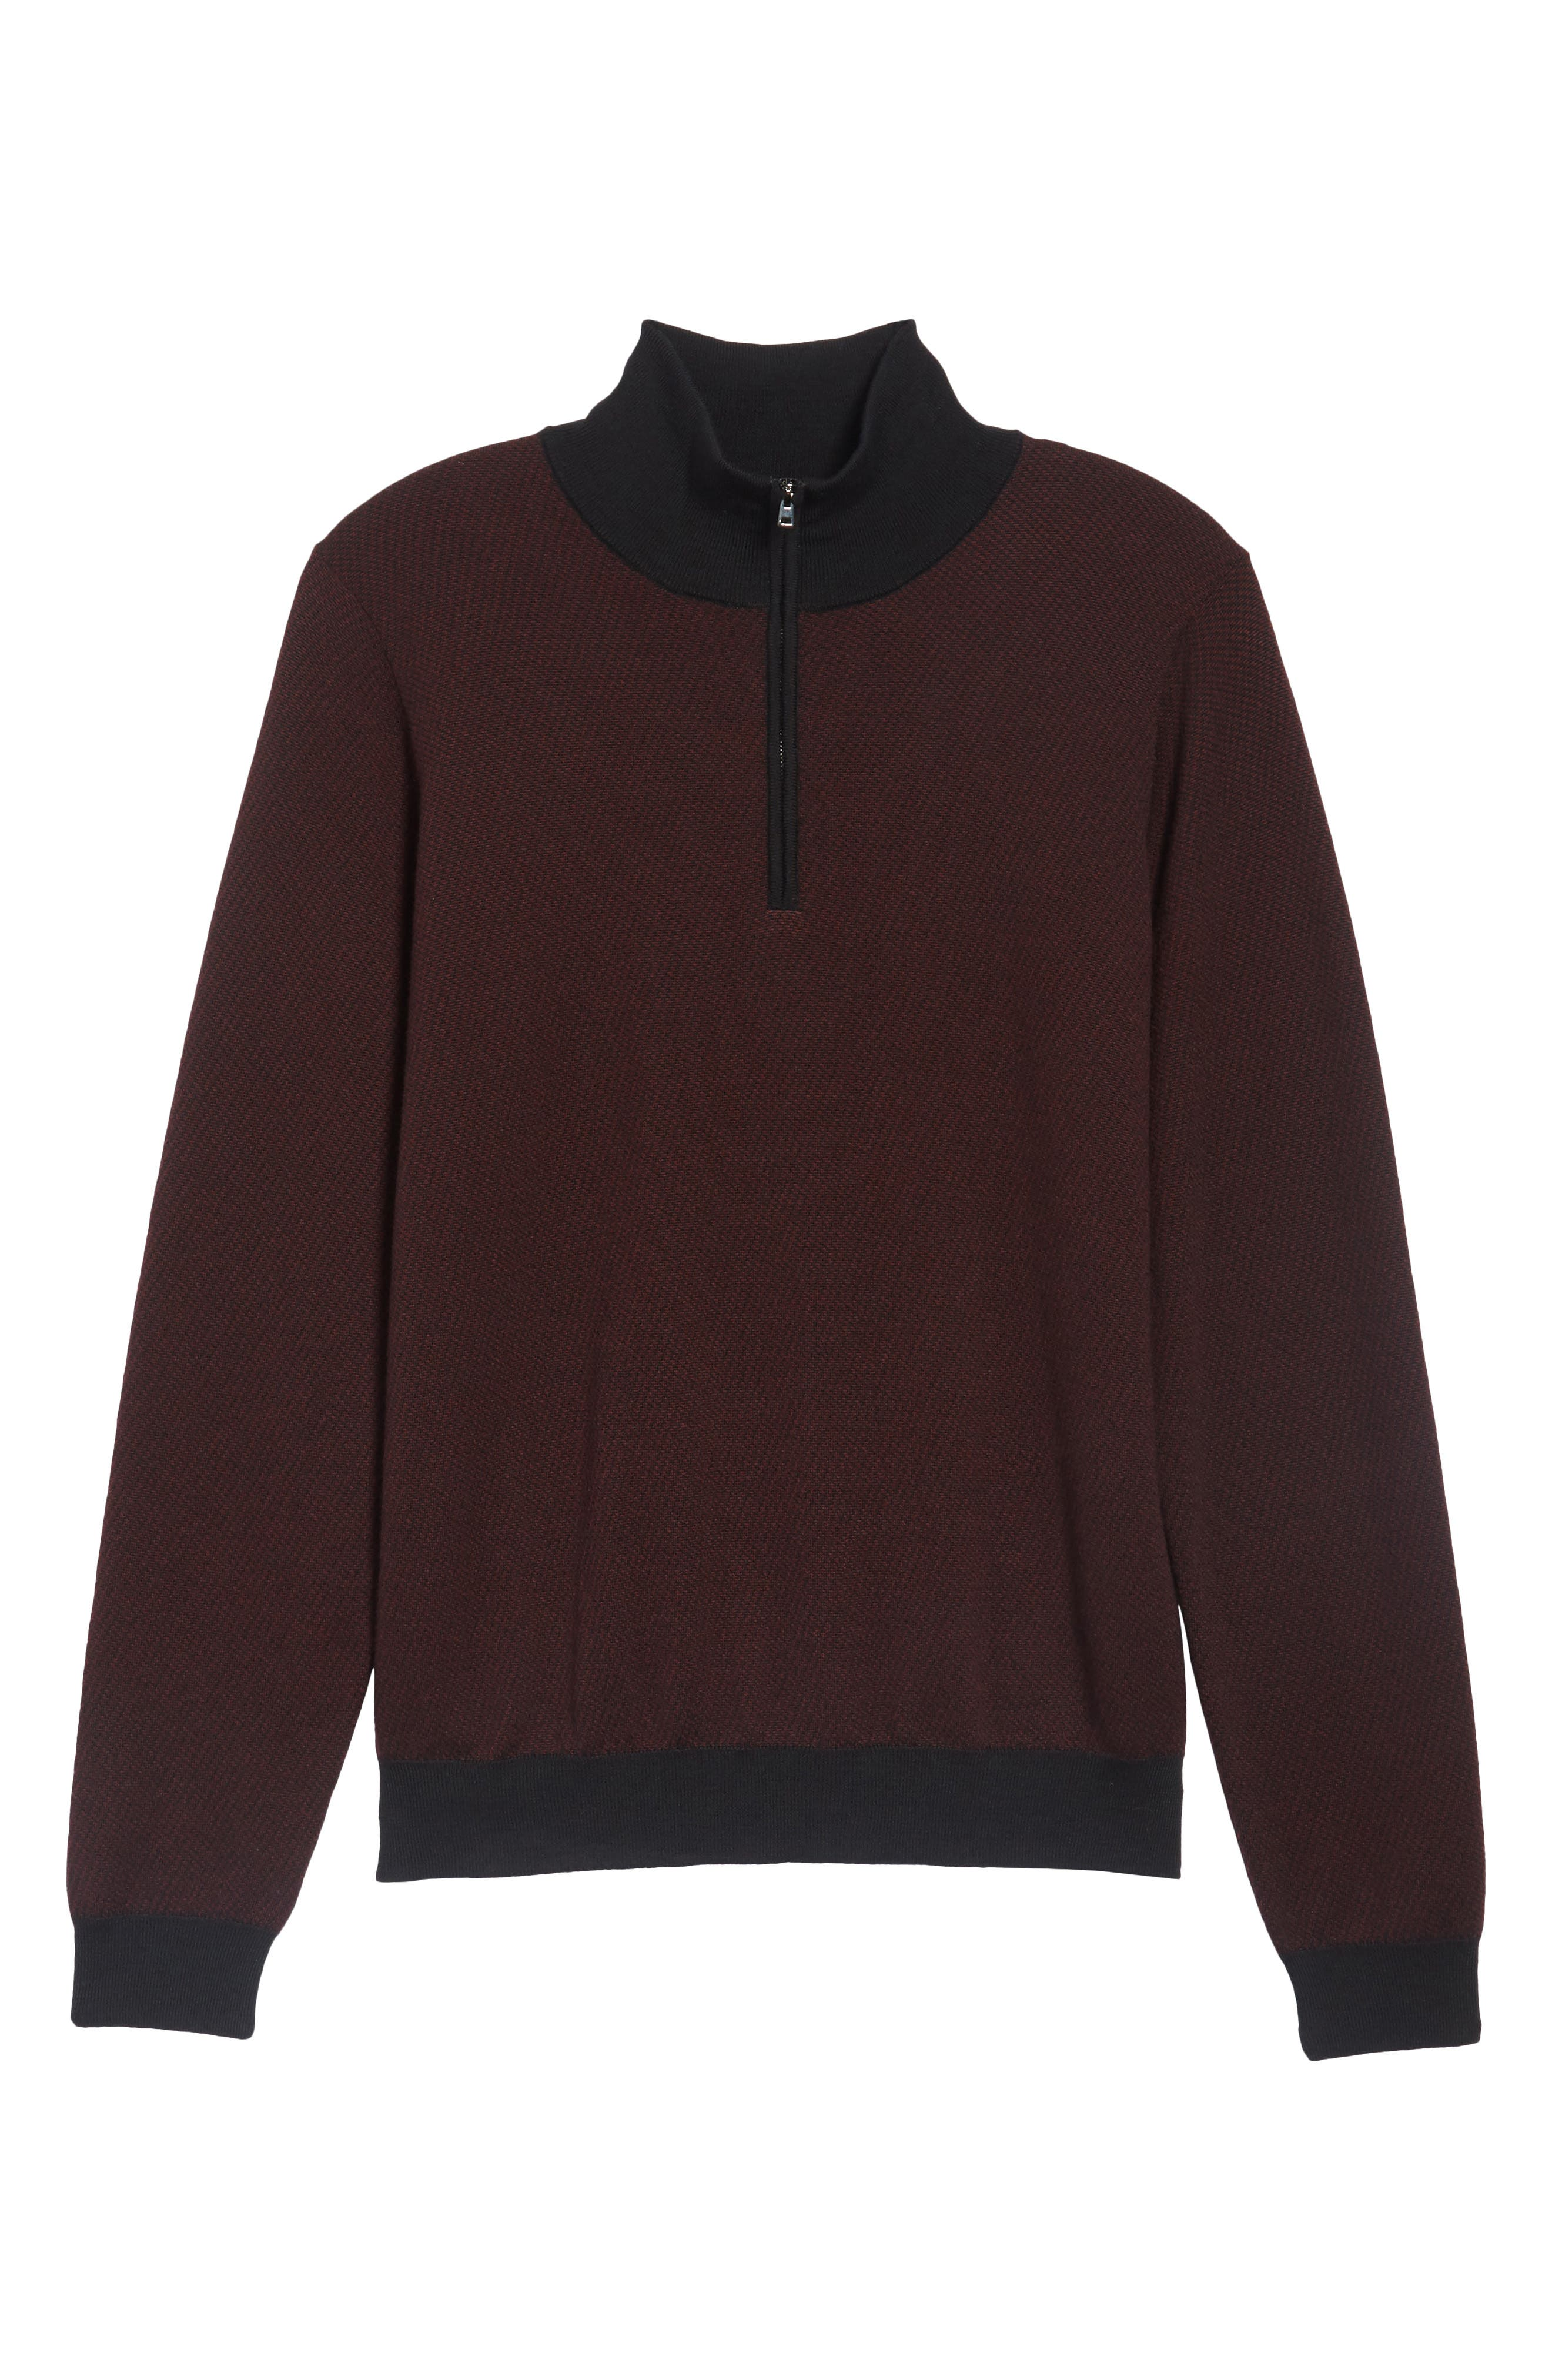 Wool Quarter Zip Mock Neck Sweater,                             Alternate thumbnail 6, color,                             Burgundy